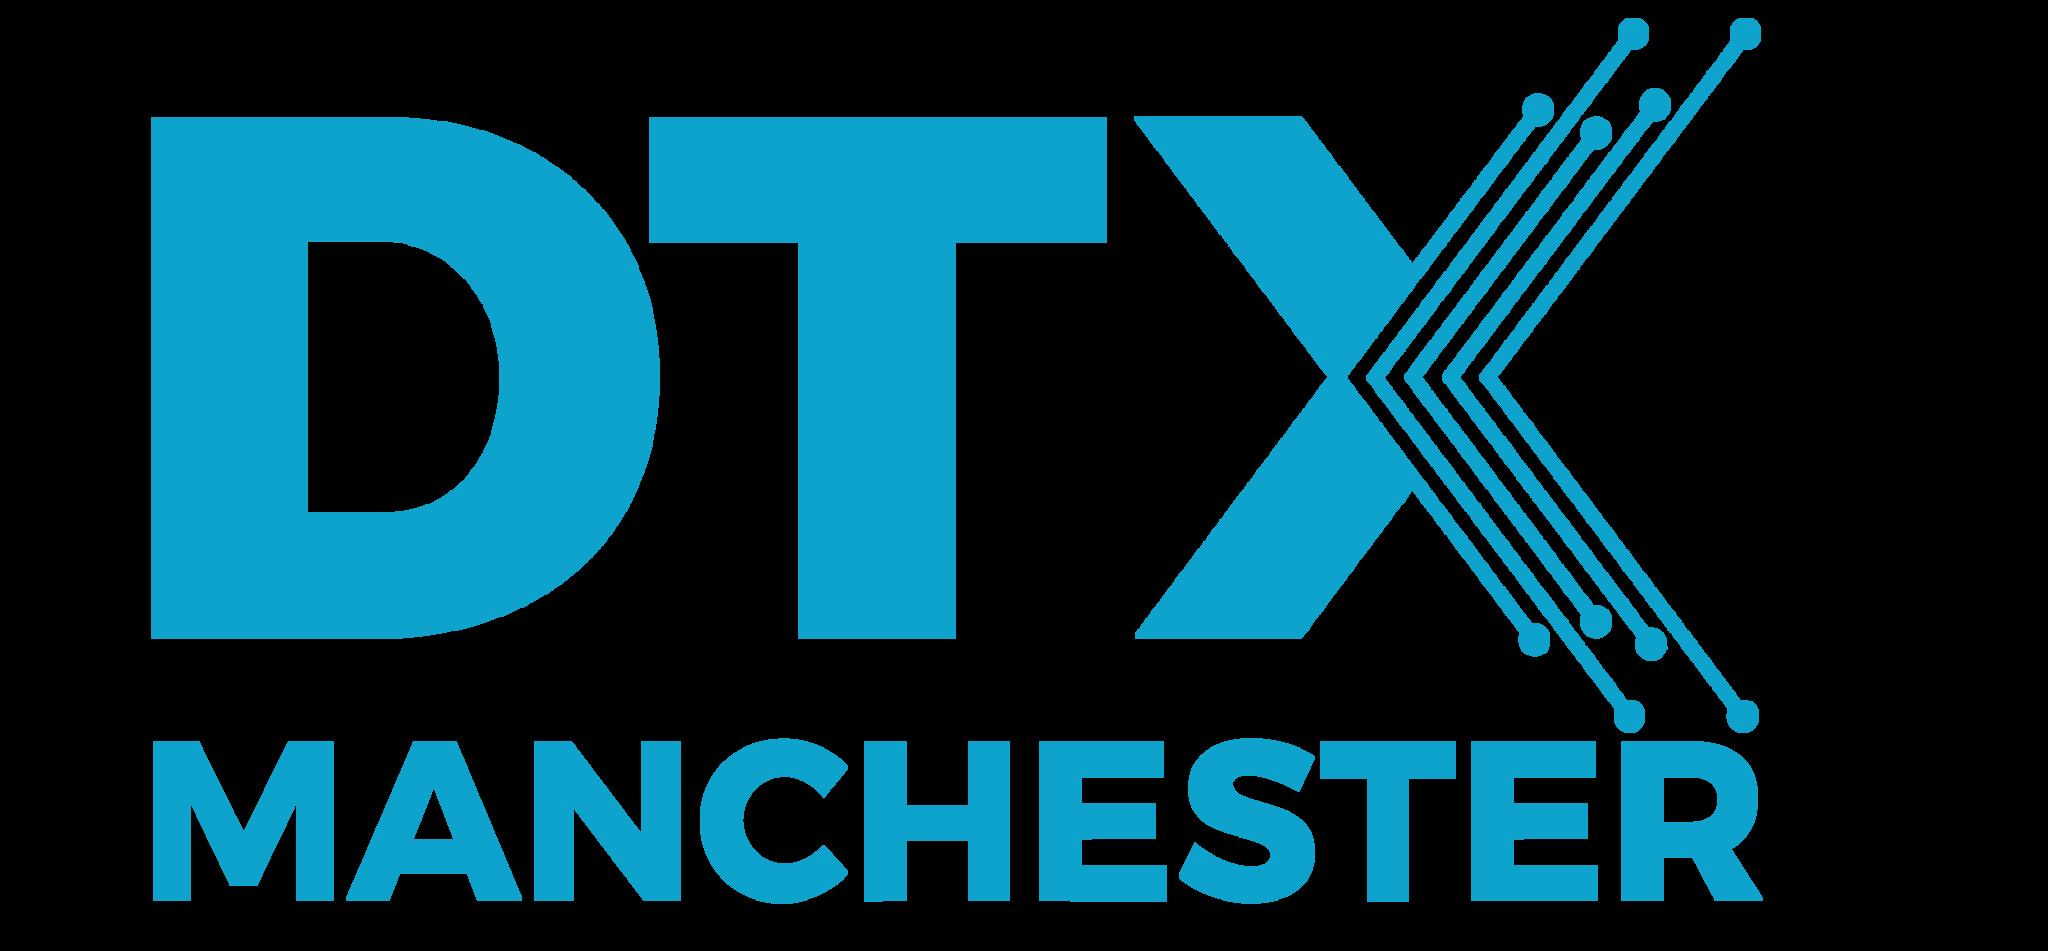 New 2020 logo